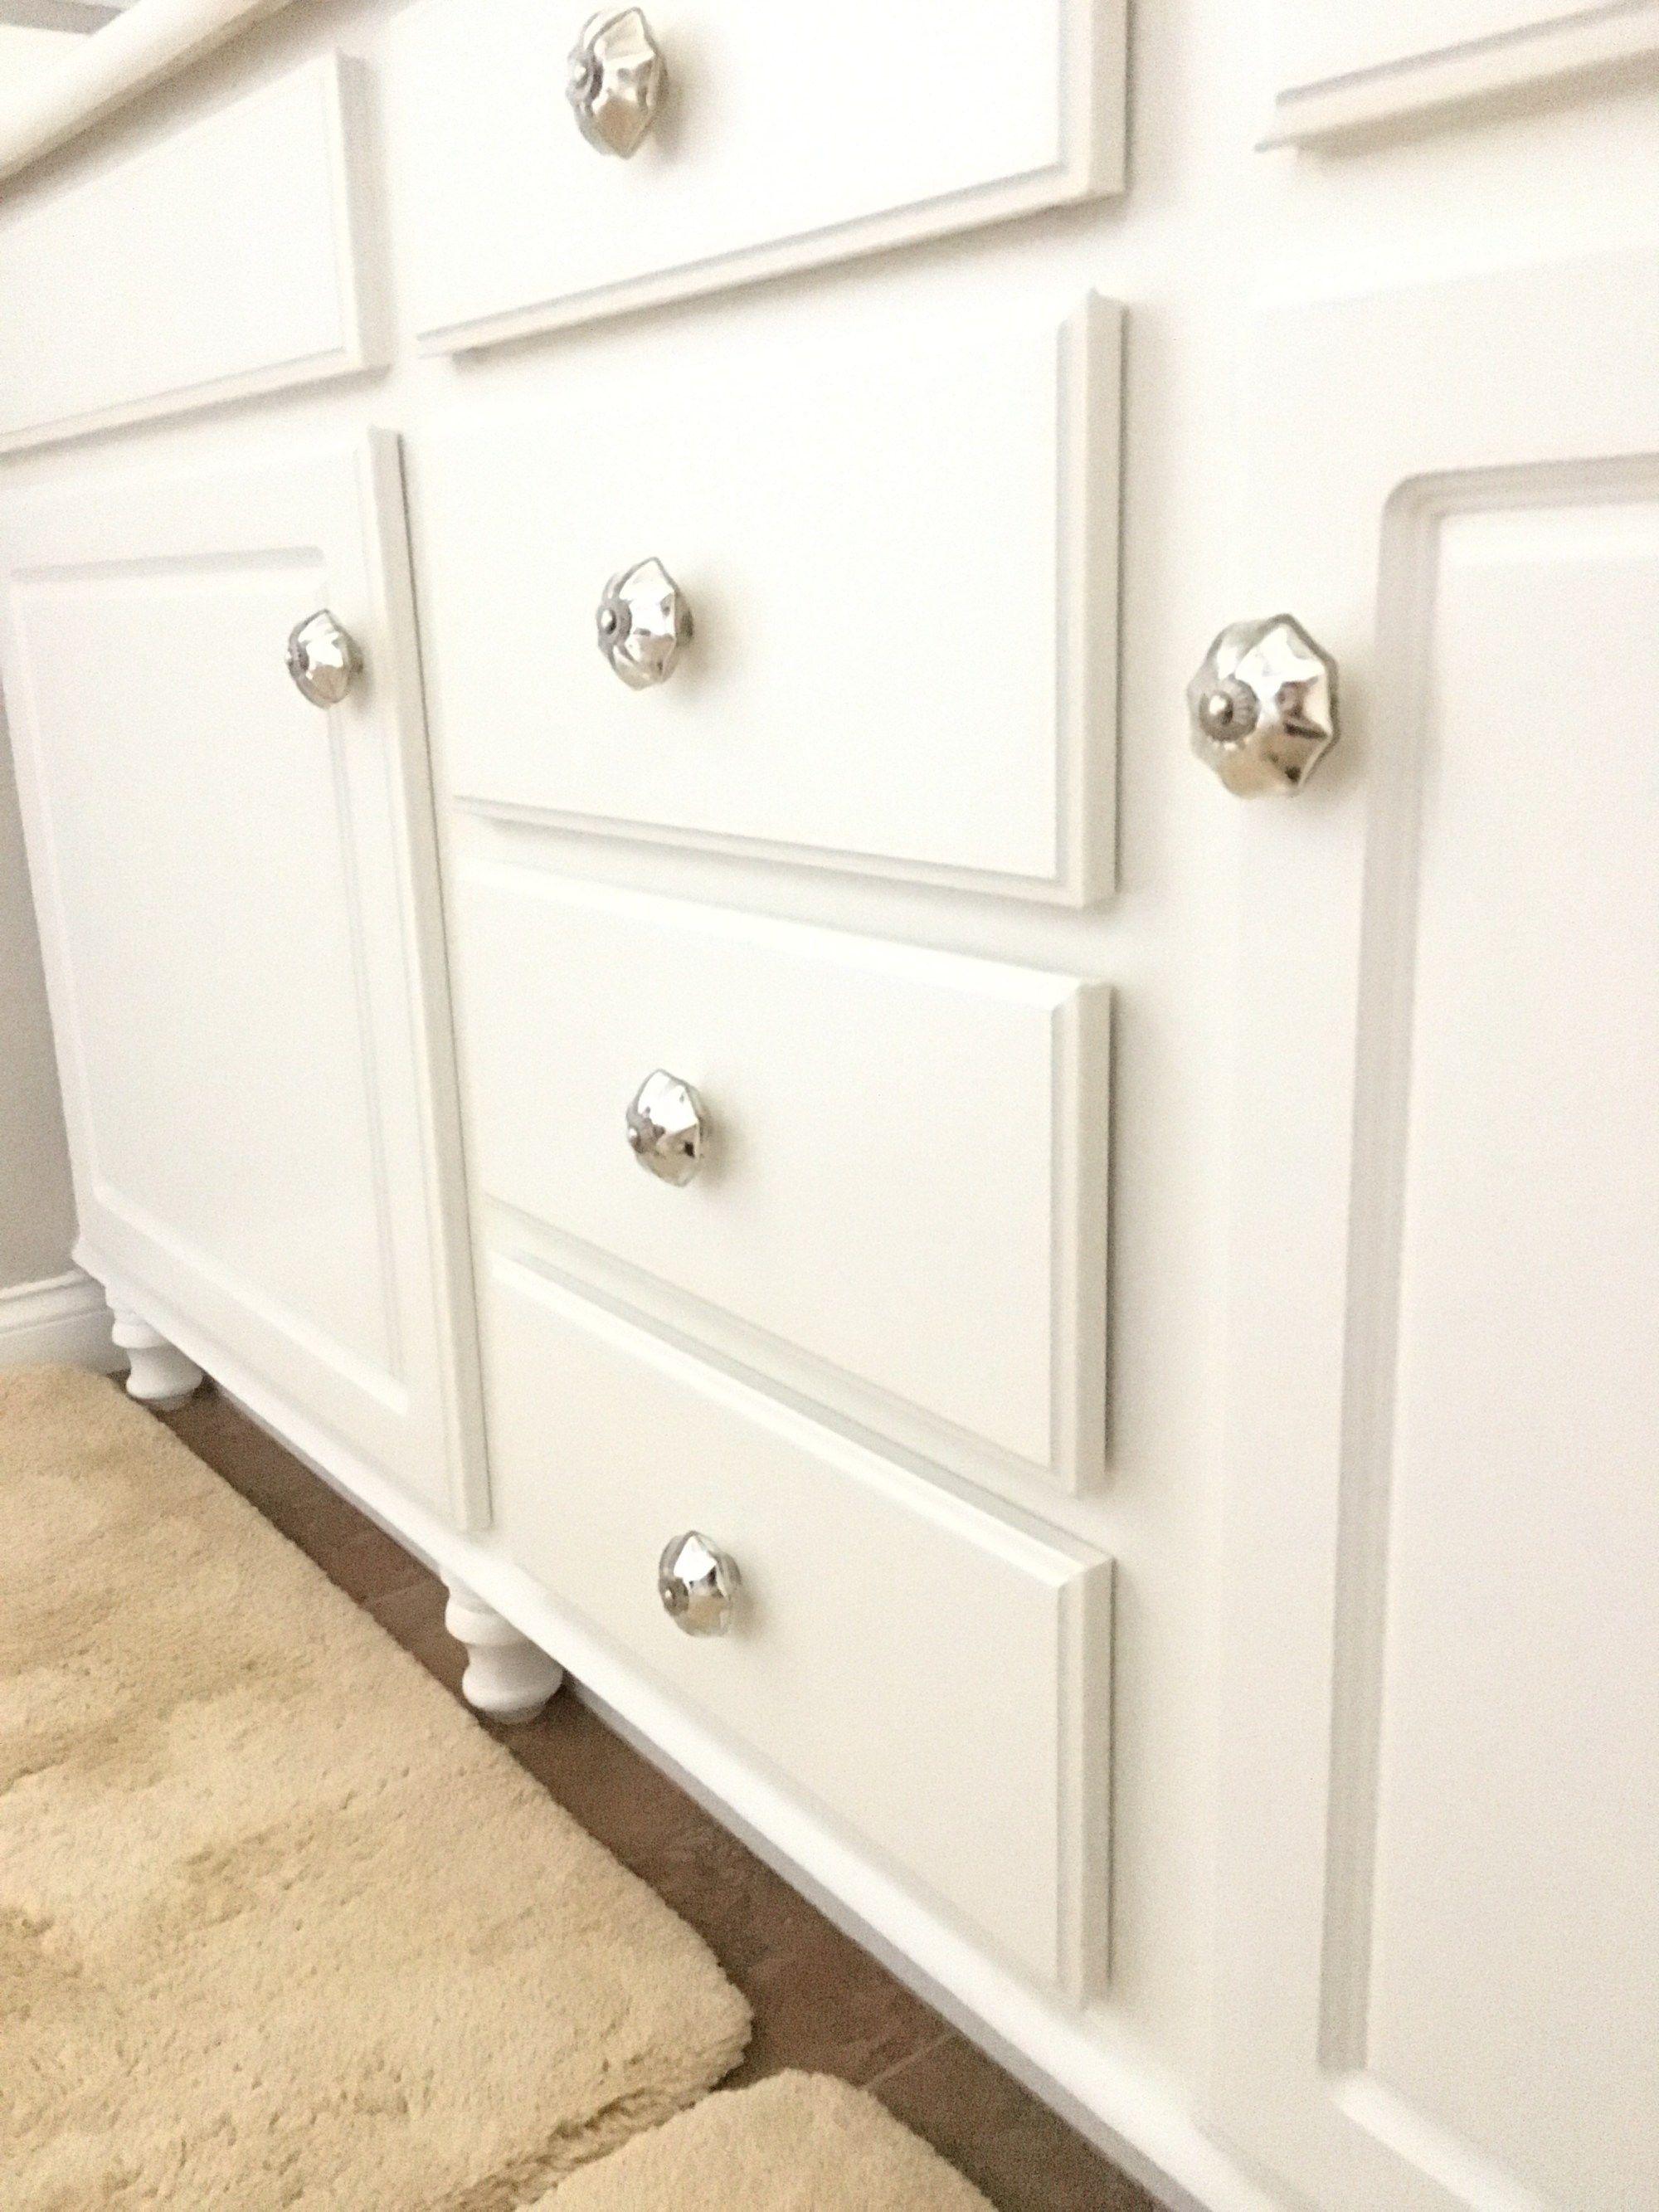 Repairing Mdf Cabinets Kitchen Cabinets Mdf Cabinets Mdf Cabinet Doors Kitchen Cabinets Mdf